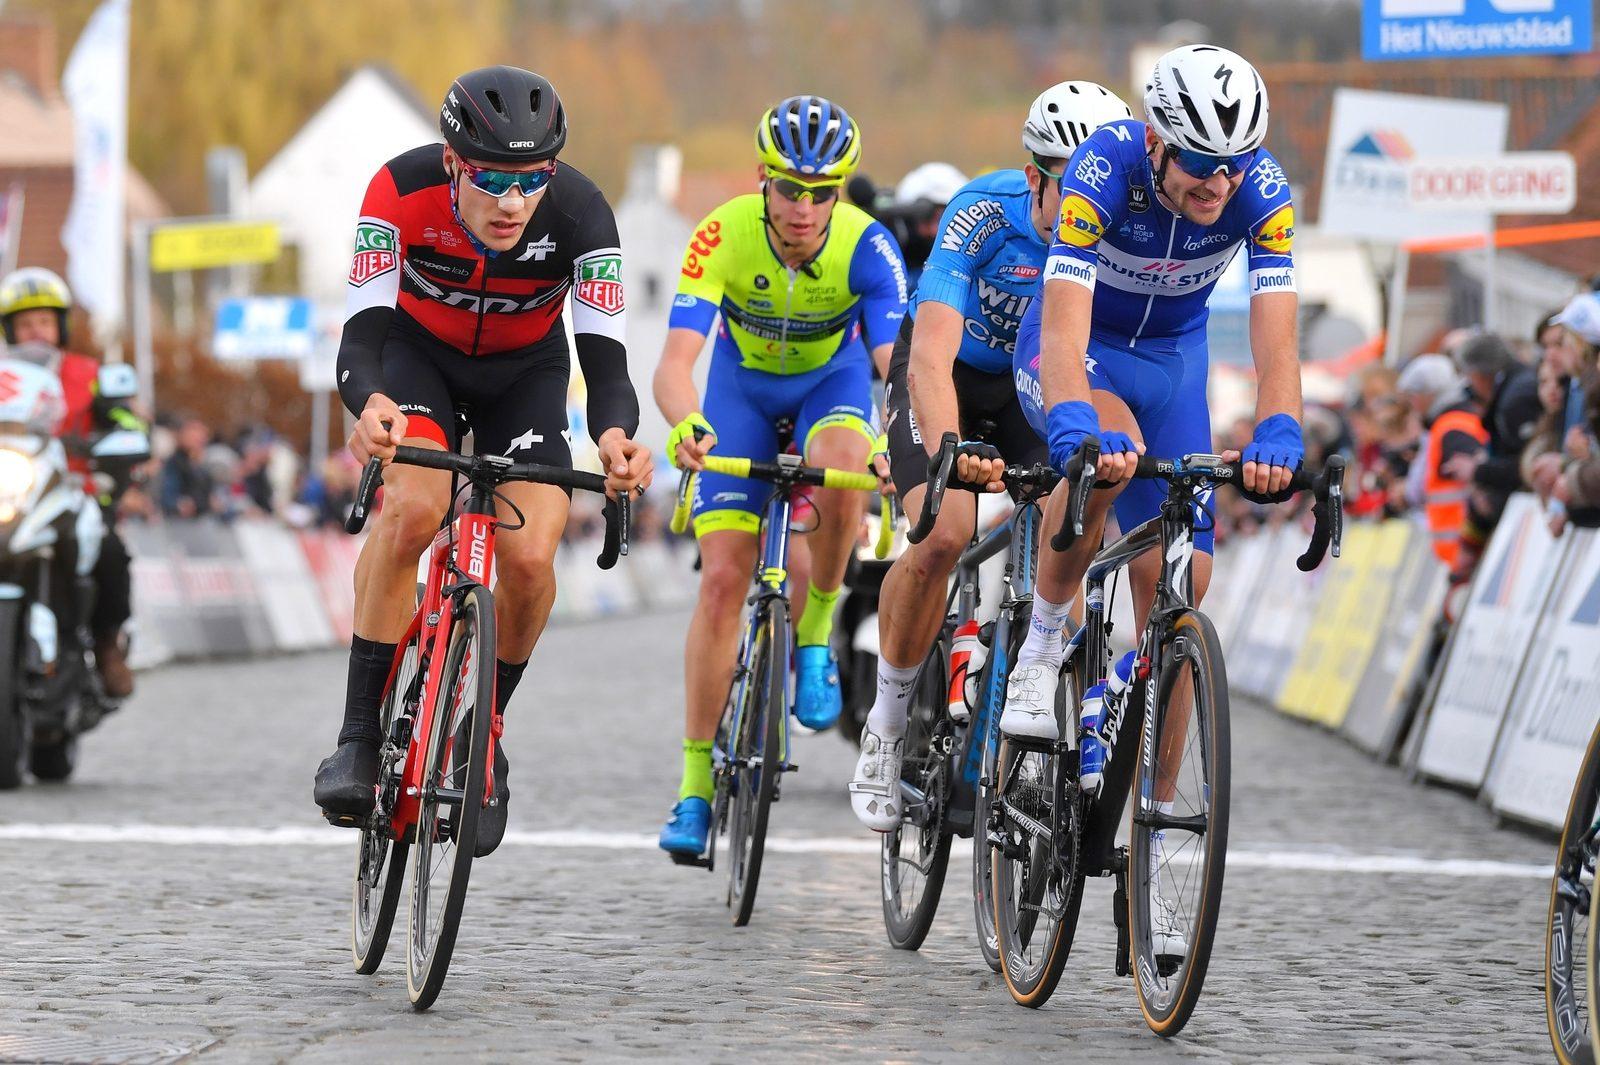 Фабио Якобсен выиграл велогонку «Нокере — Кёрсе»